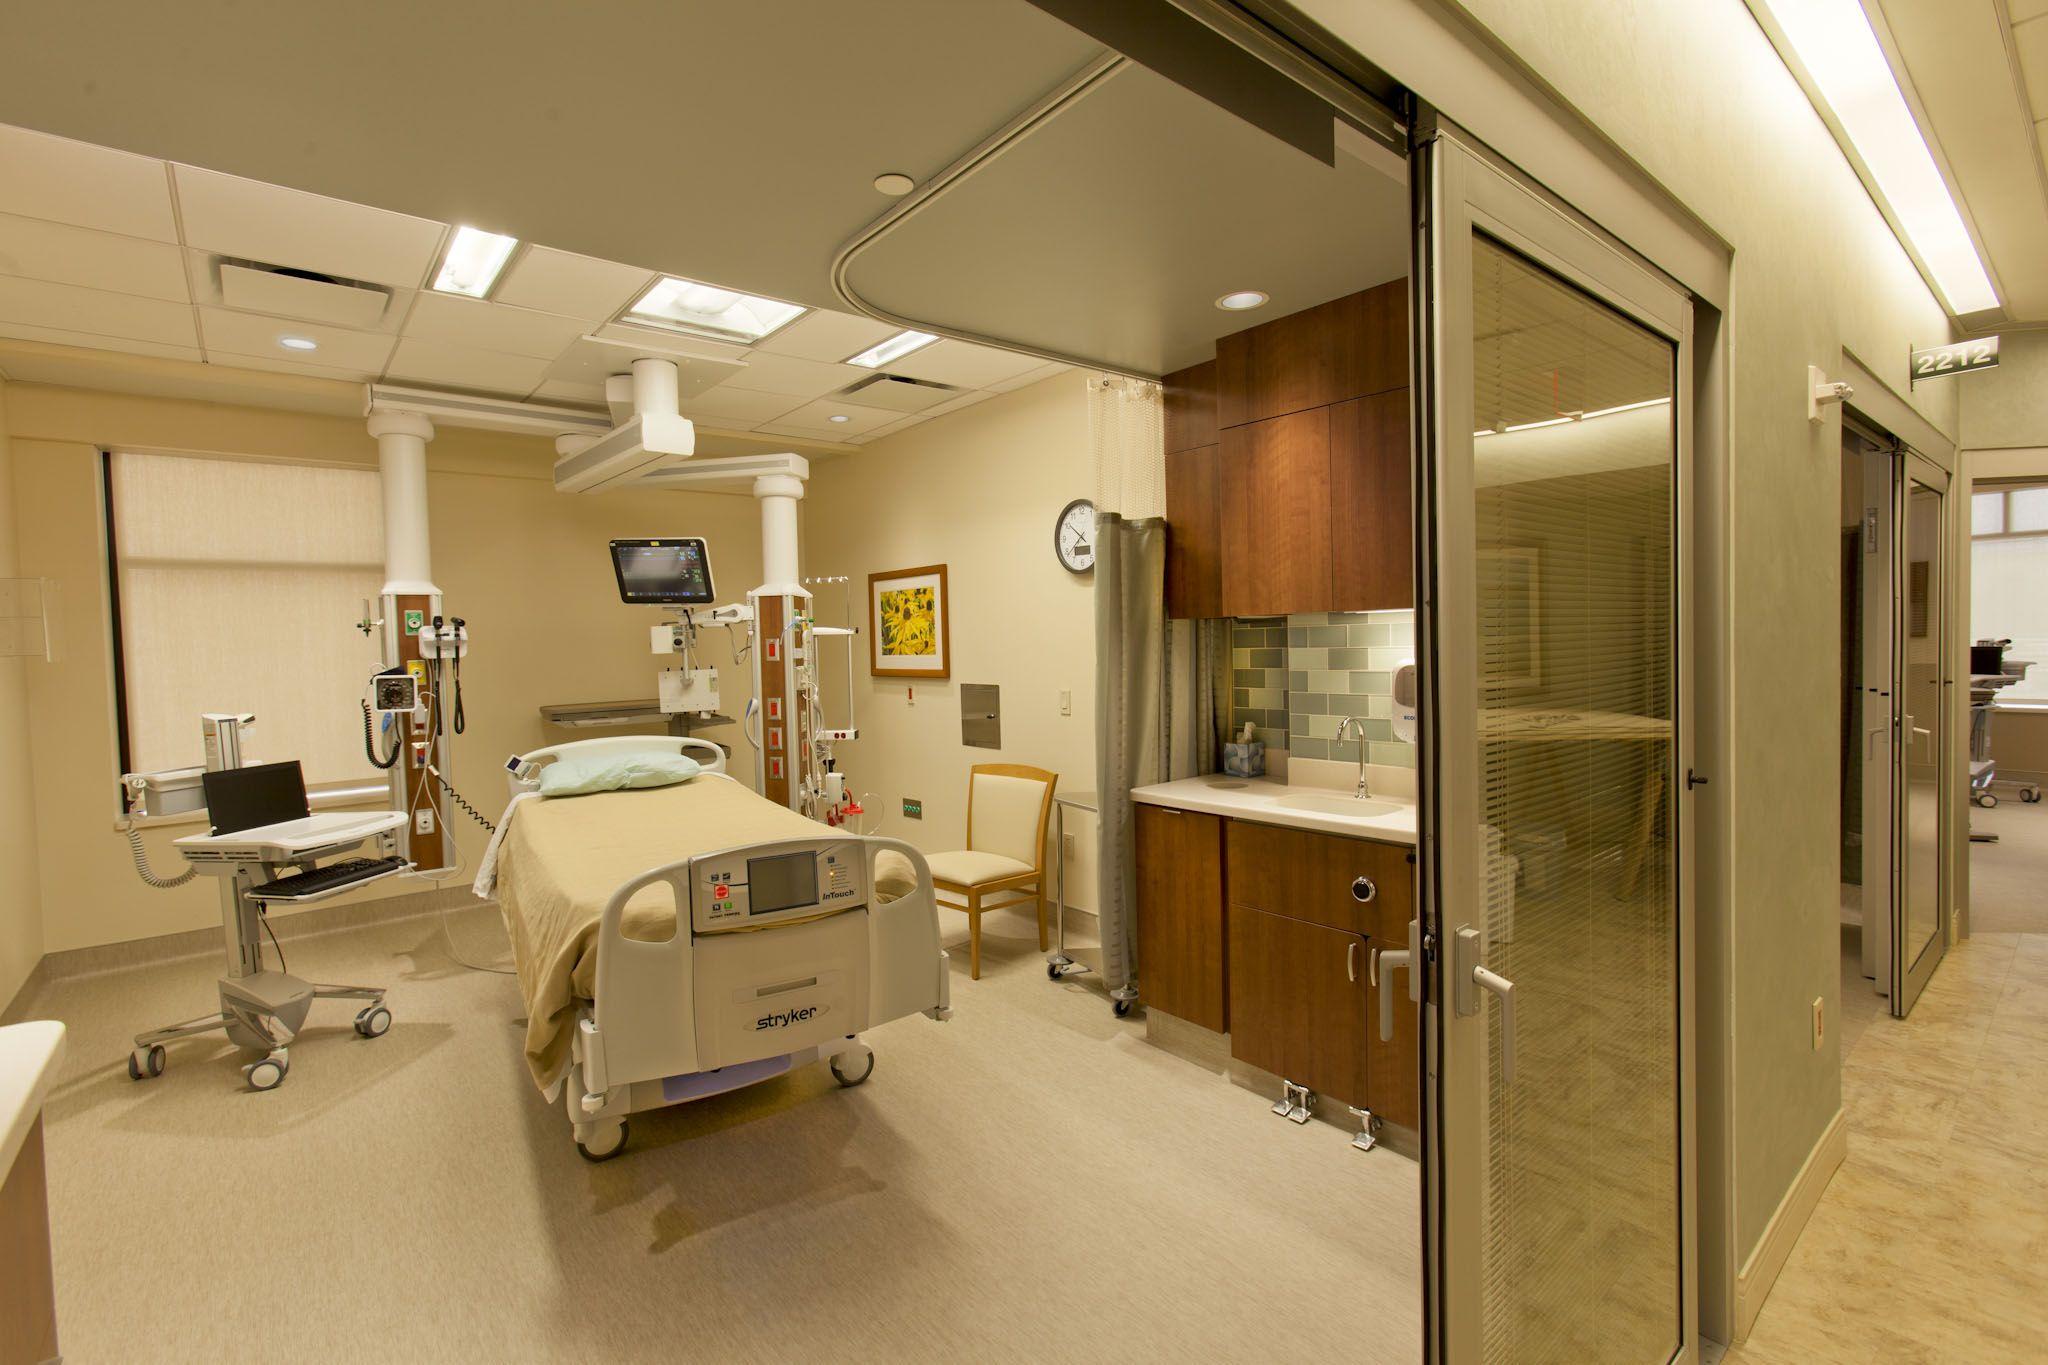 Patient Room Headwall Lighting Key Considerations In